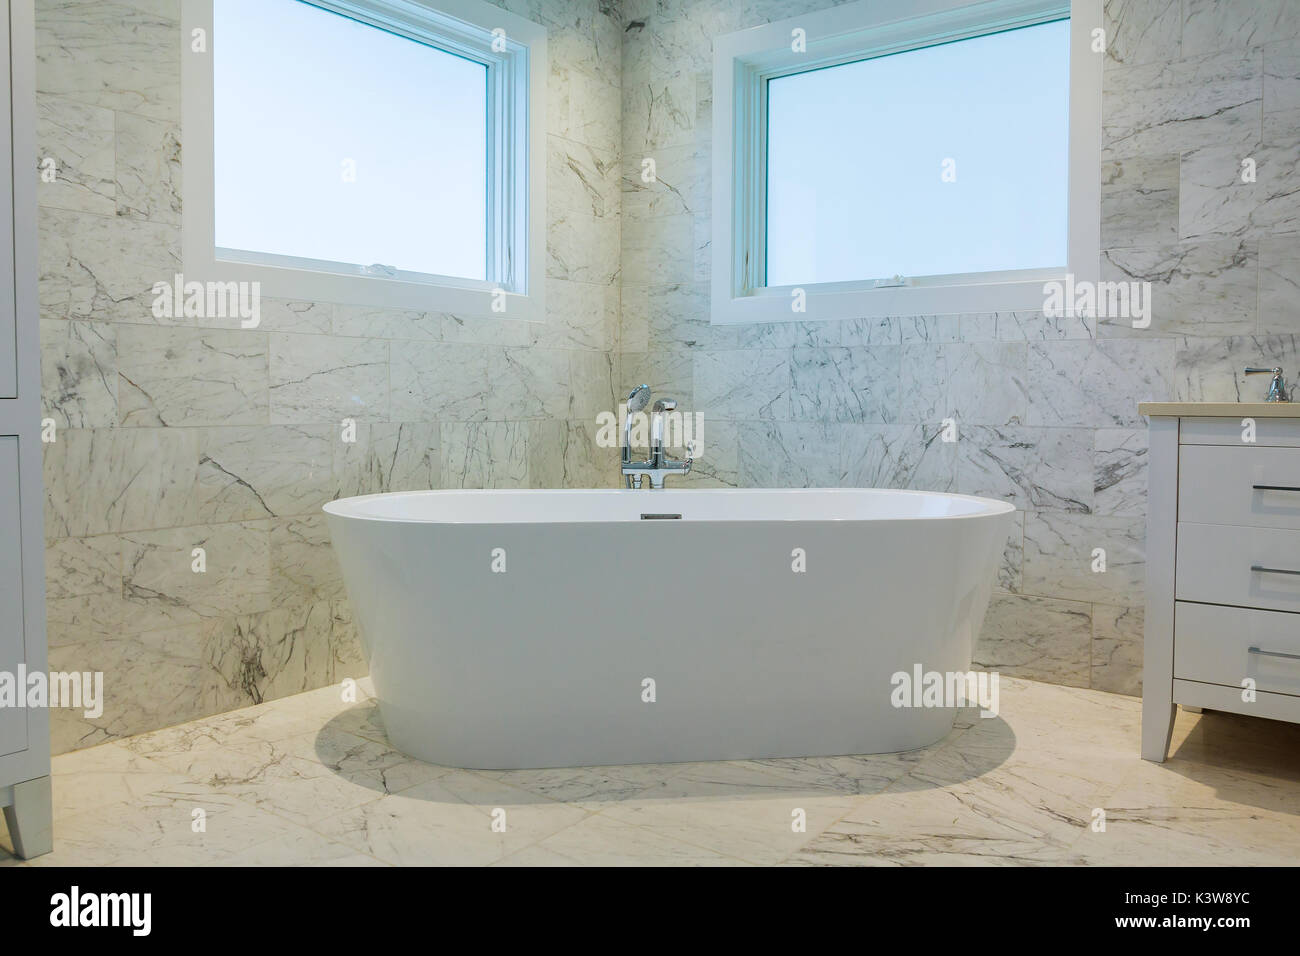 Vasca Da Bagno Stile Francese : Bagno di lusso in stile francese in casa da bagno retrò bianco foto